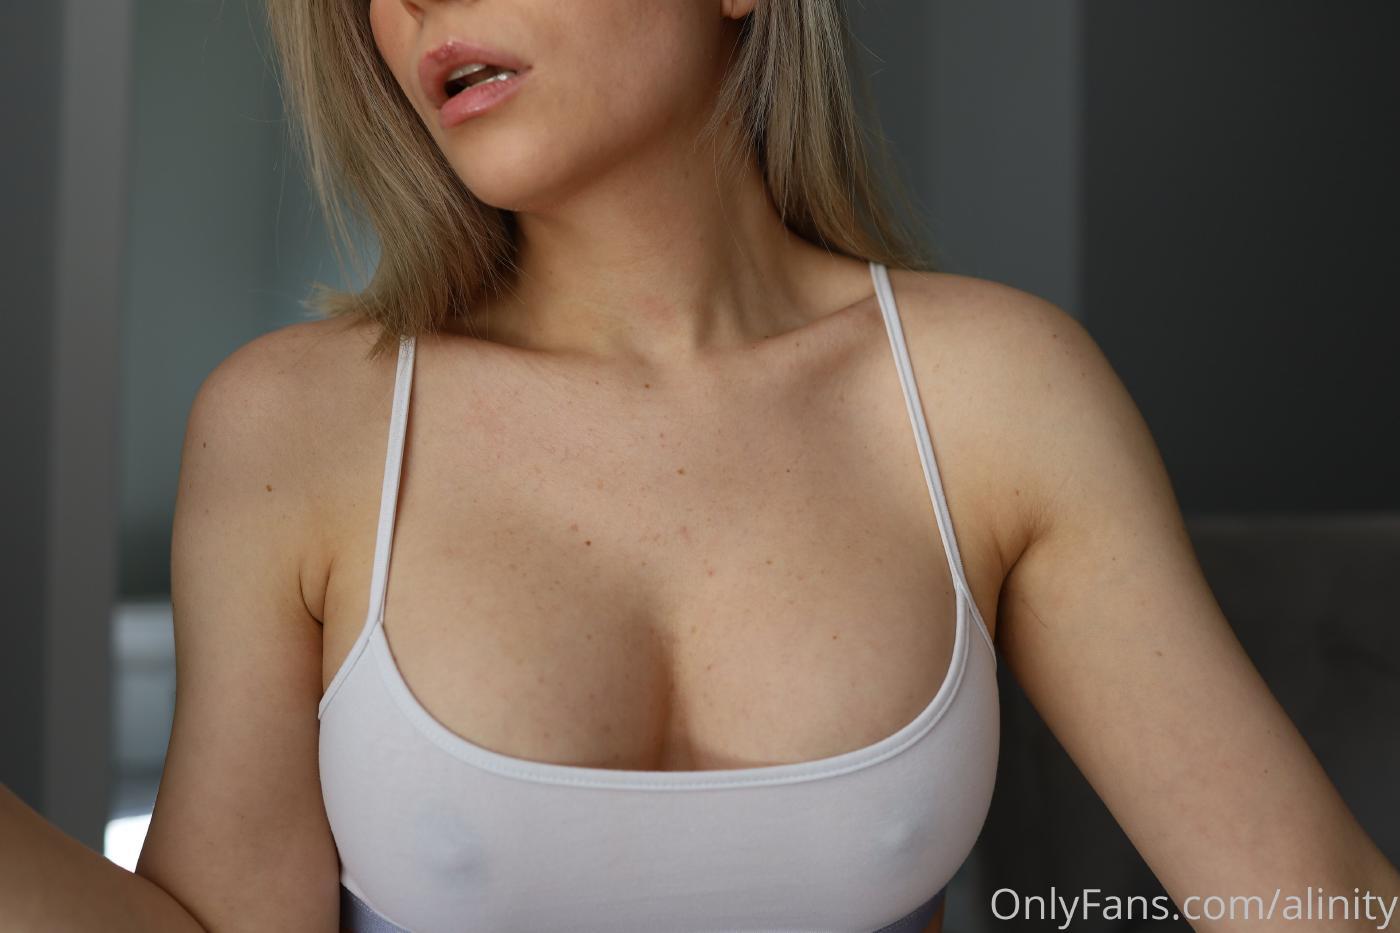 Alinity Nipple Tease Onlyfans Leaked 0003